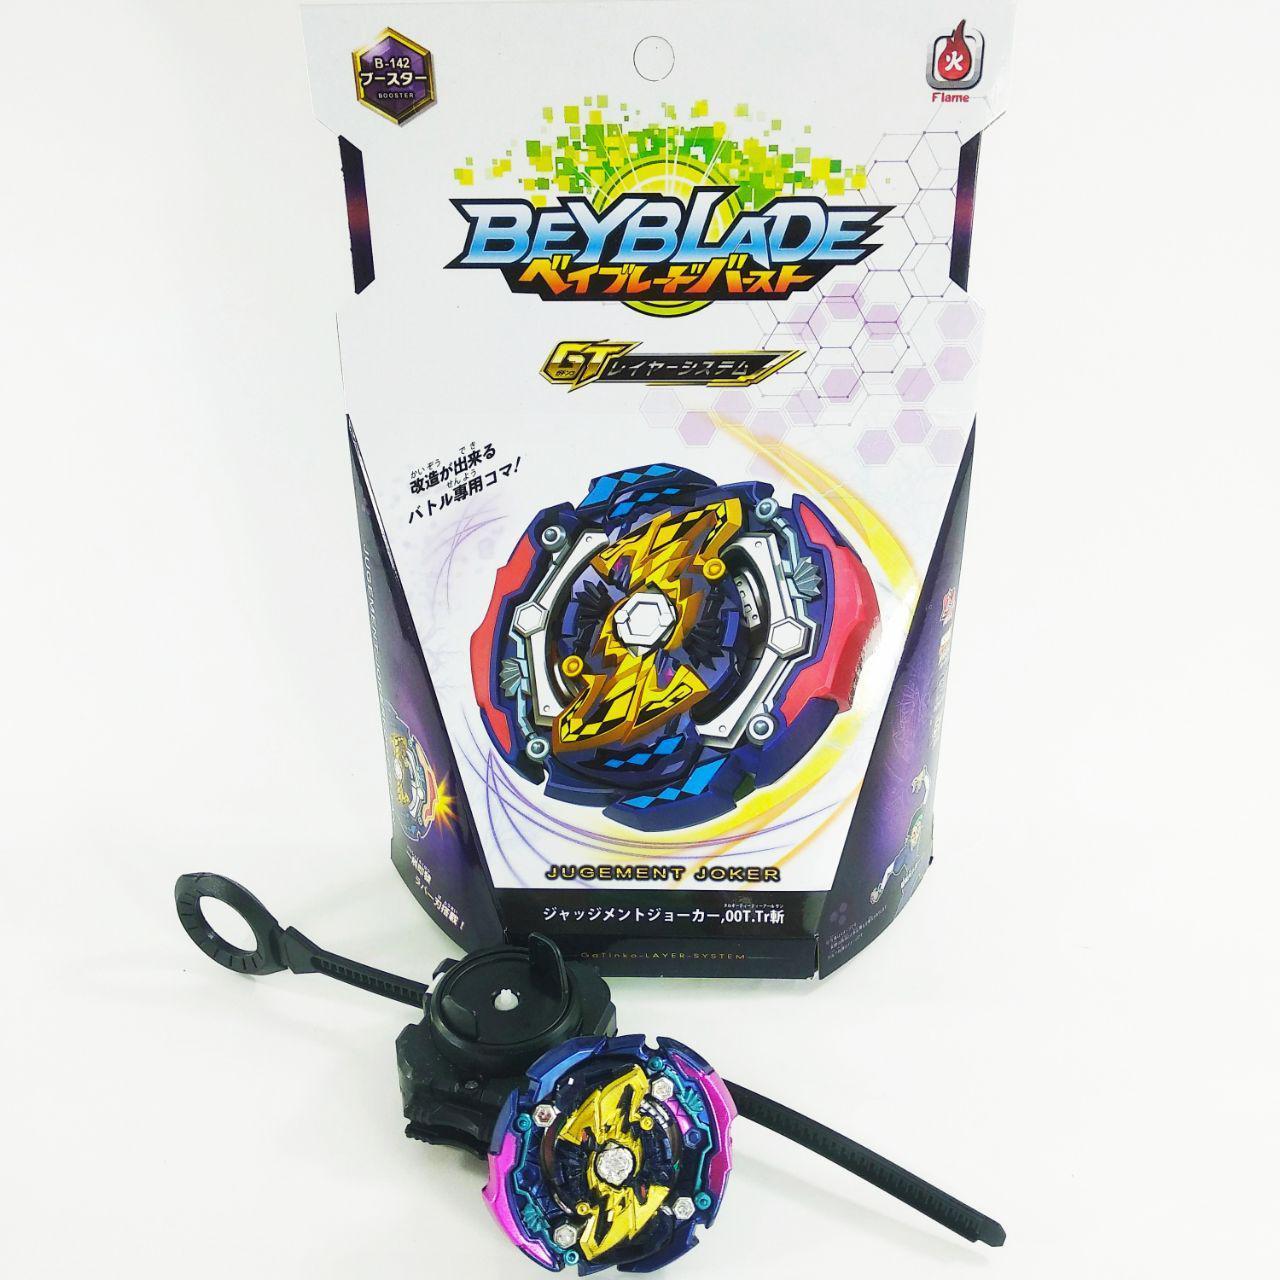 Бейблэйд Карающий Джокер B142, BeyBlade Joker -  самый популярный бей